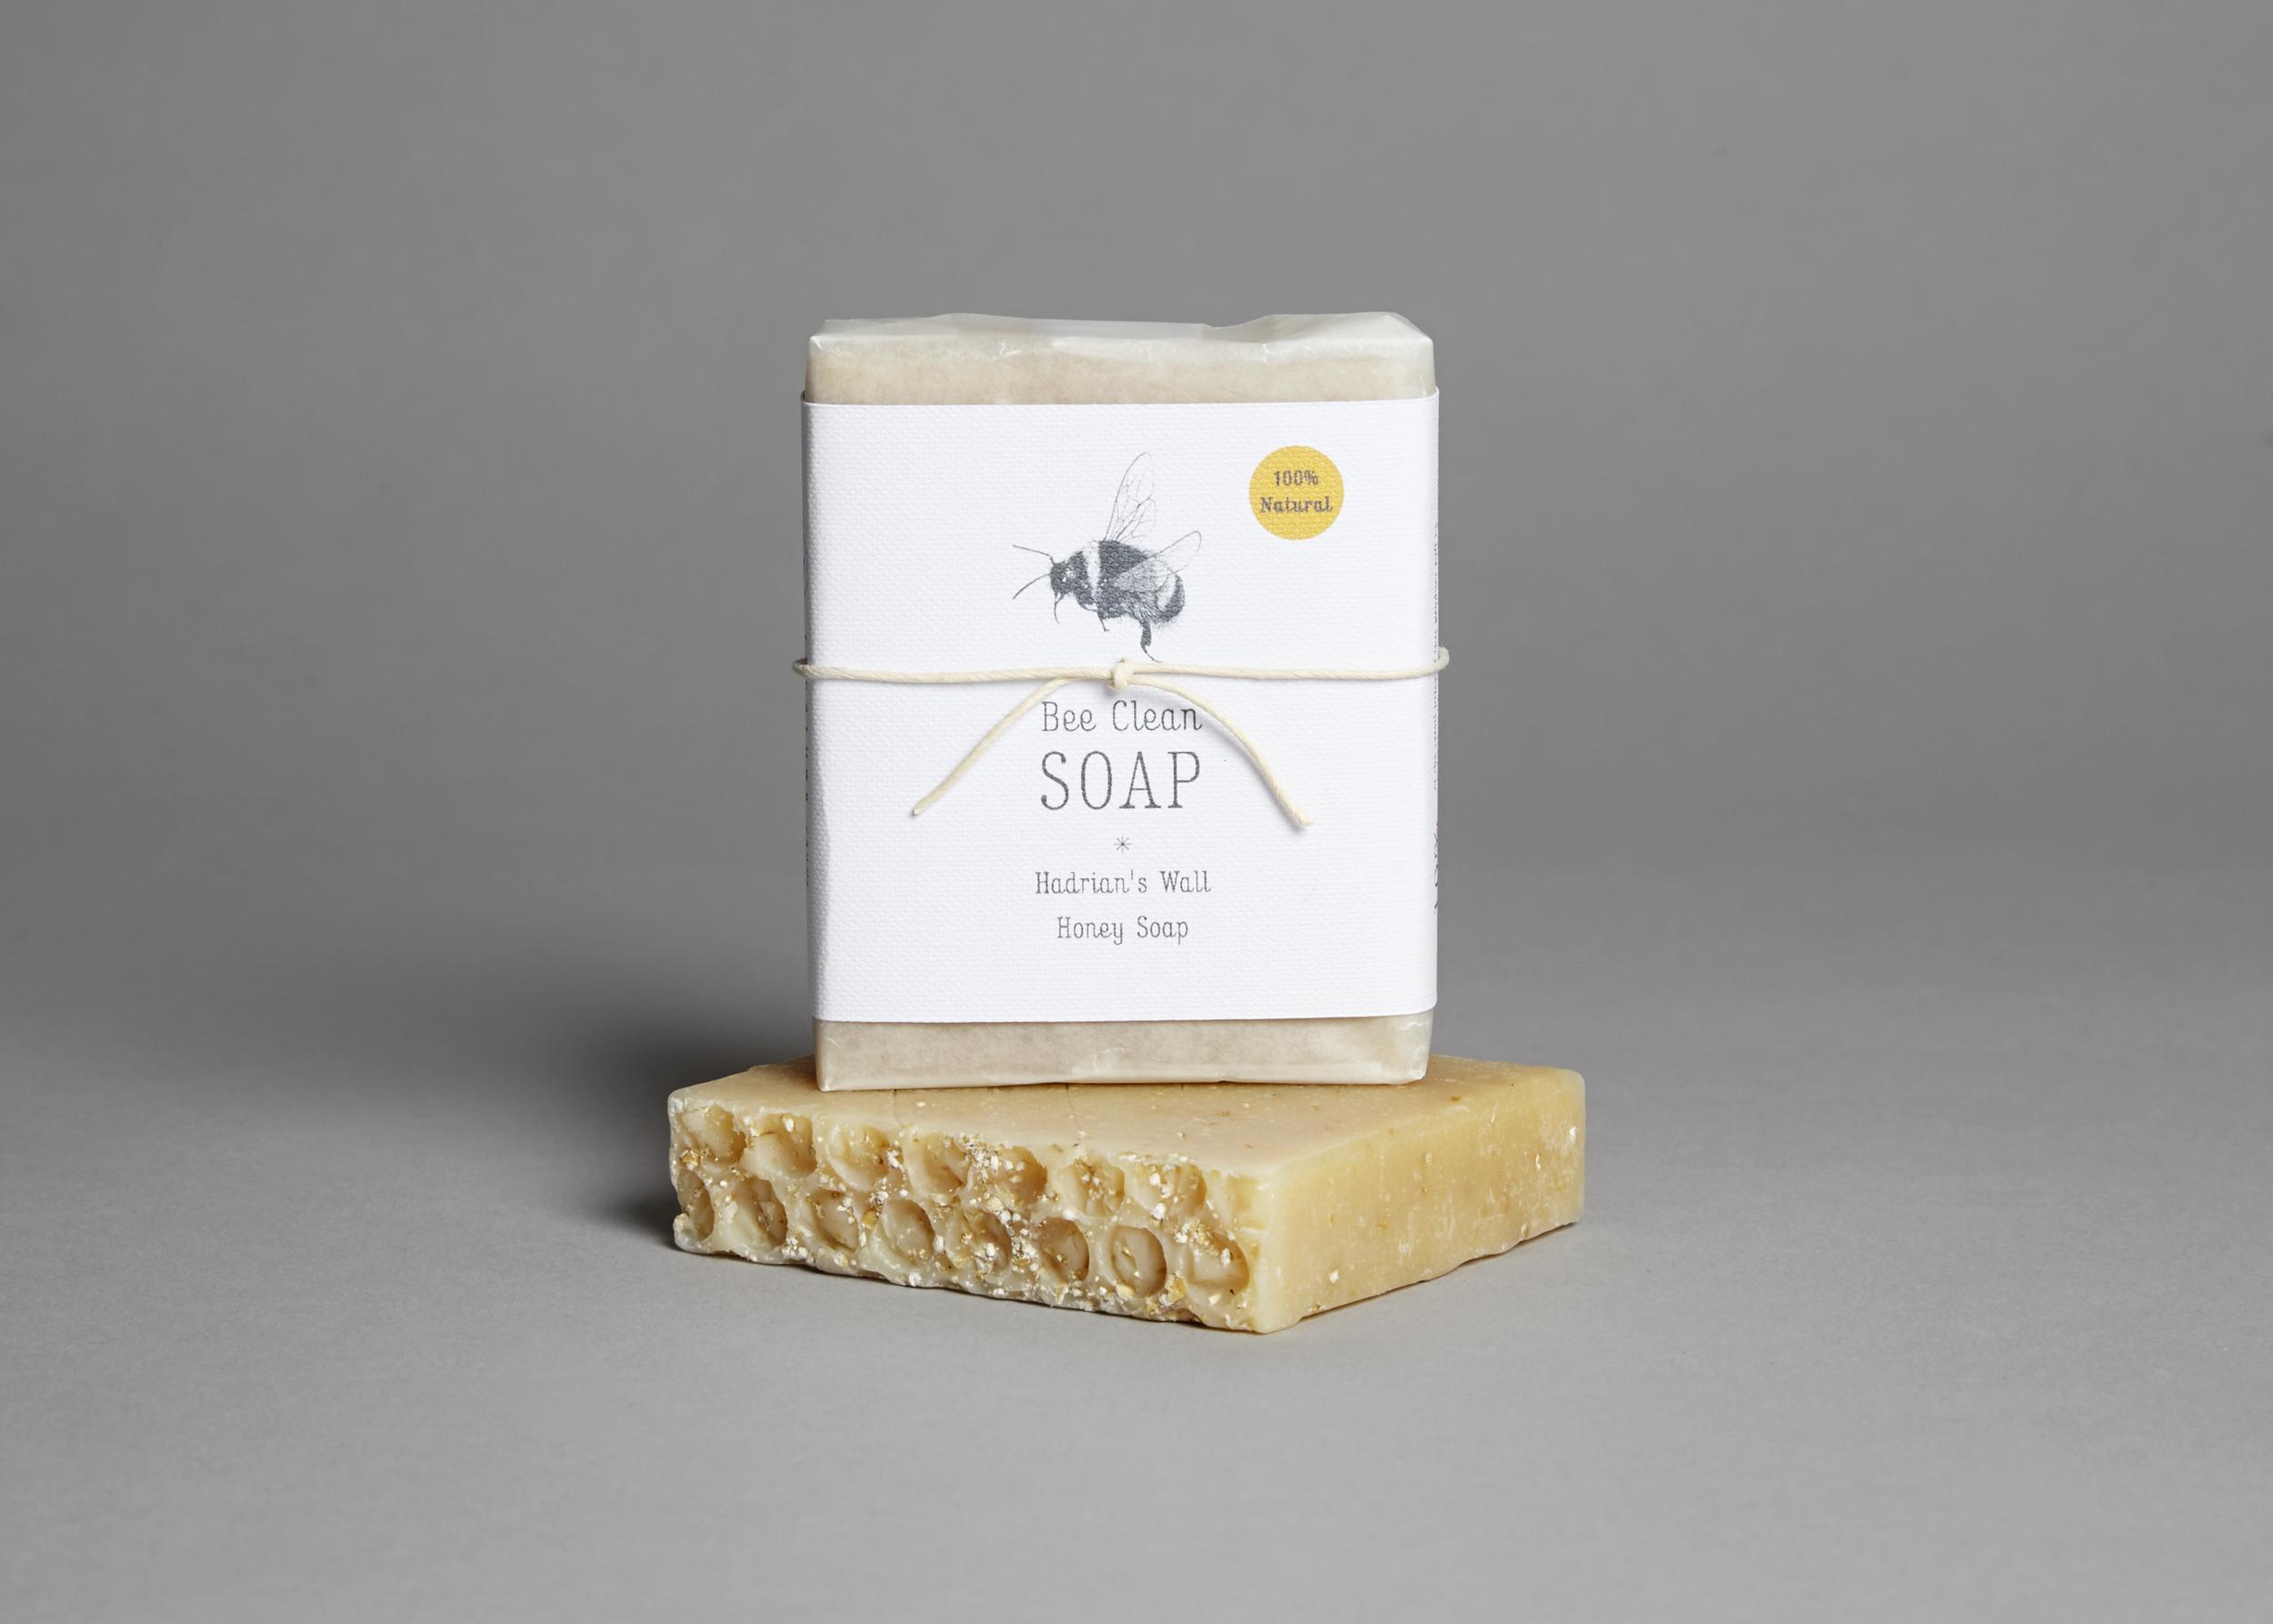 Creature Candy honey soap